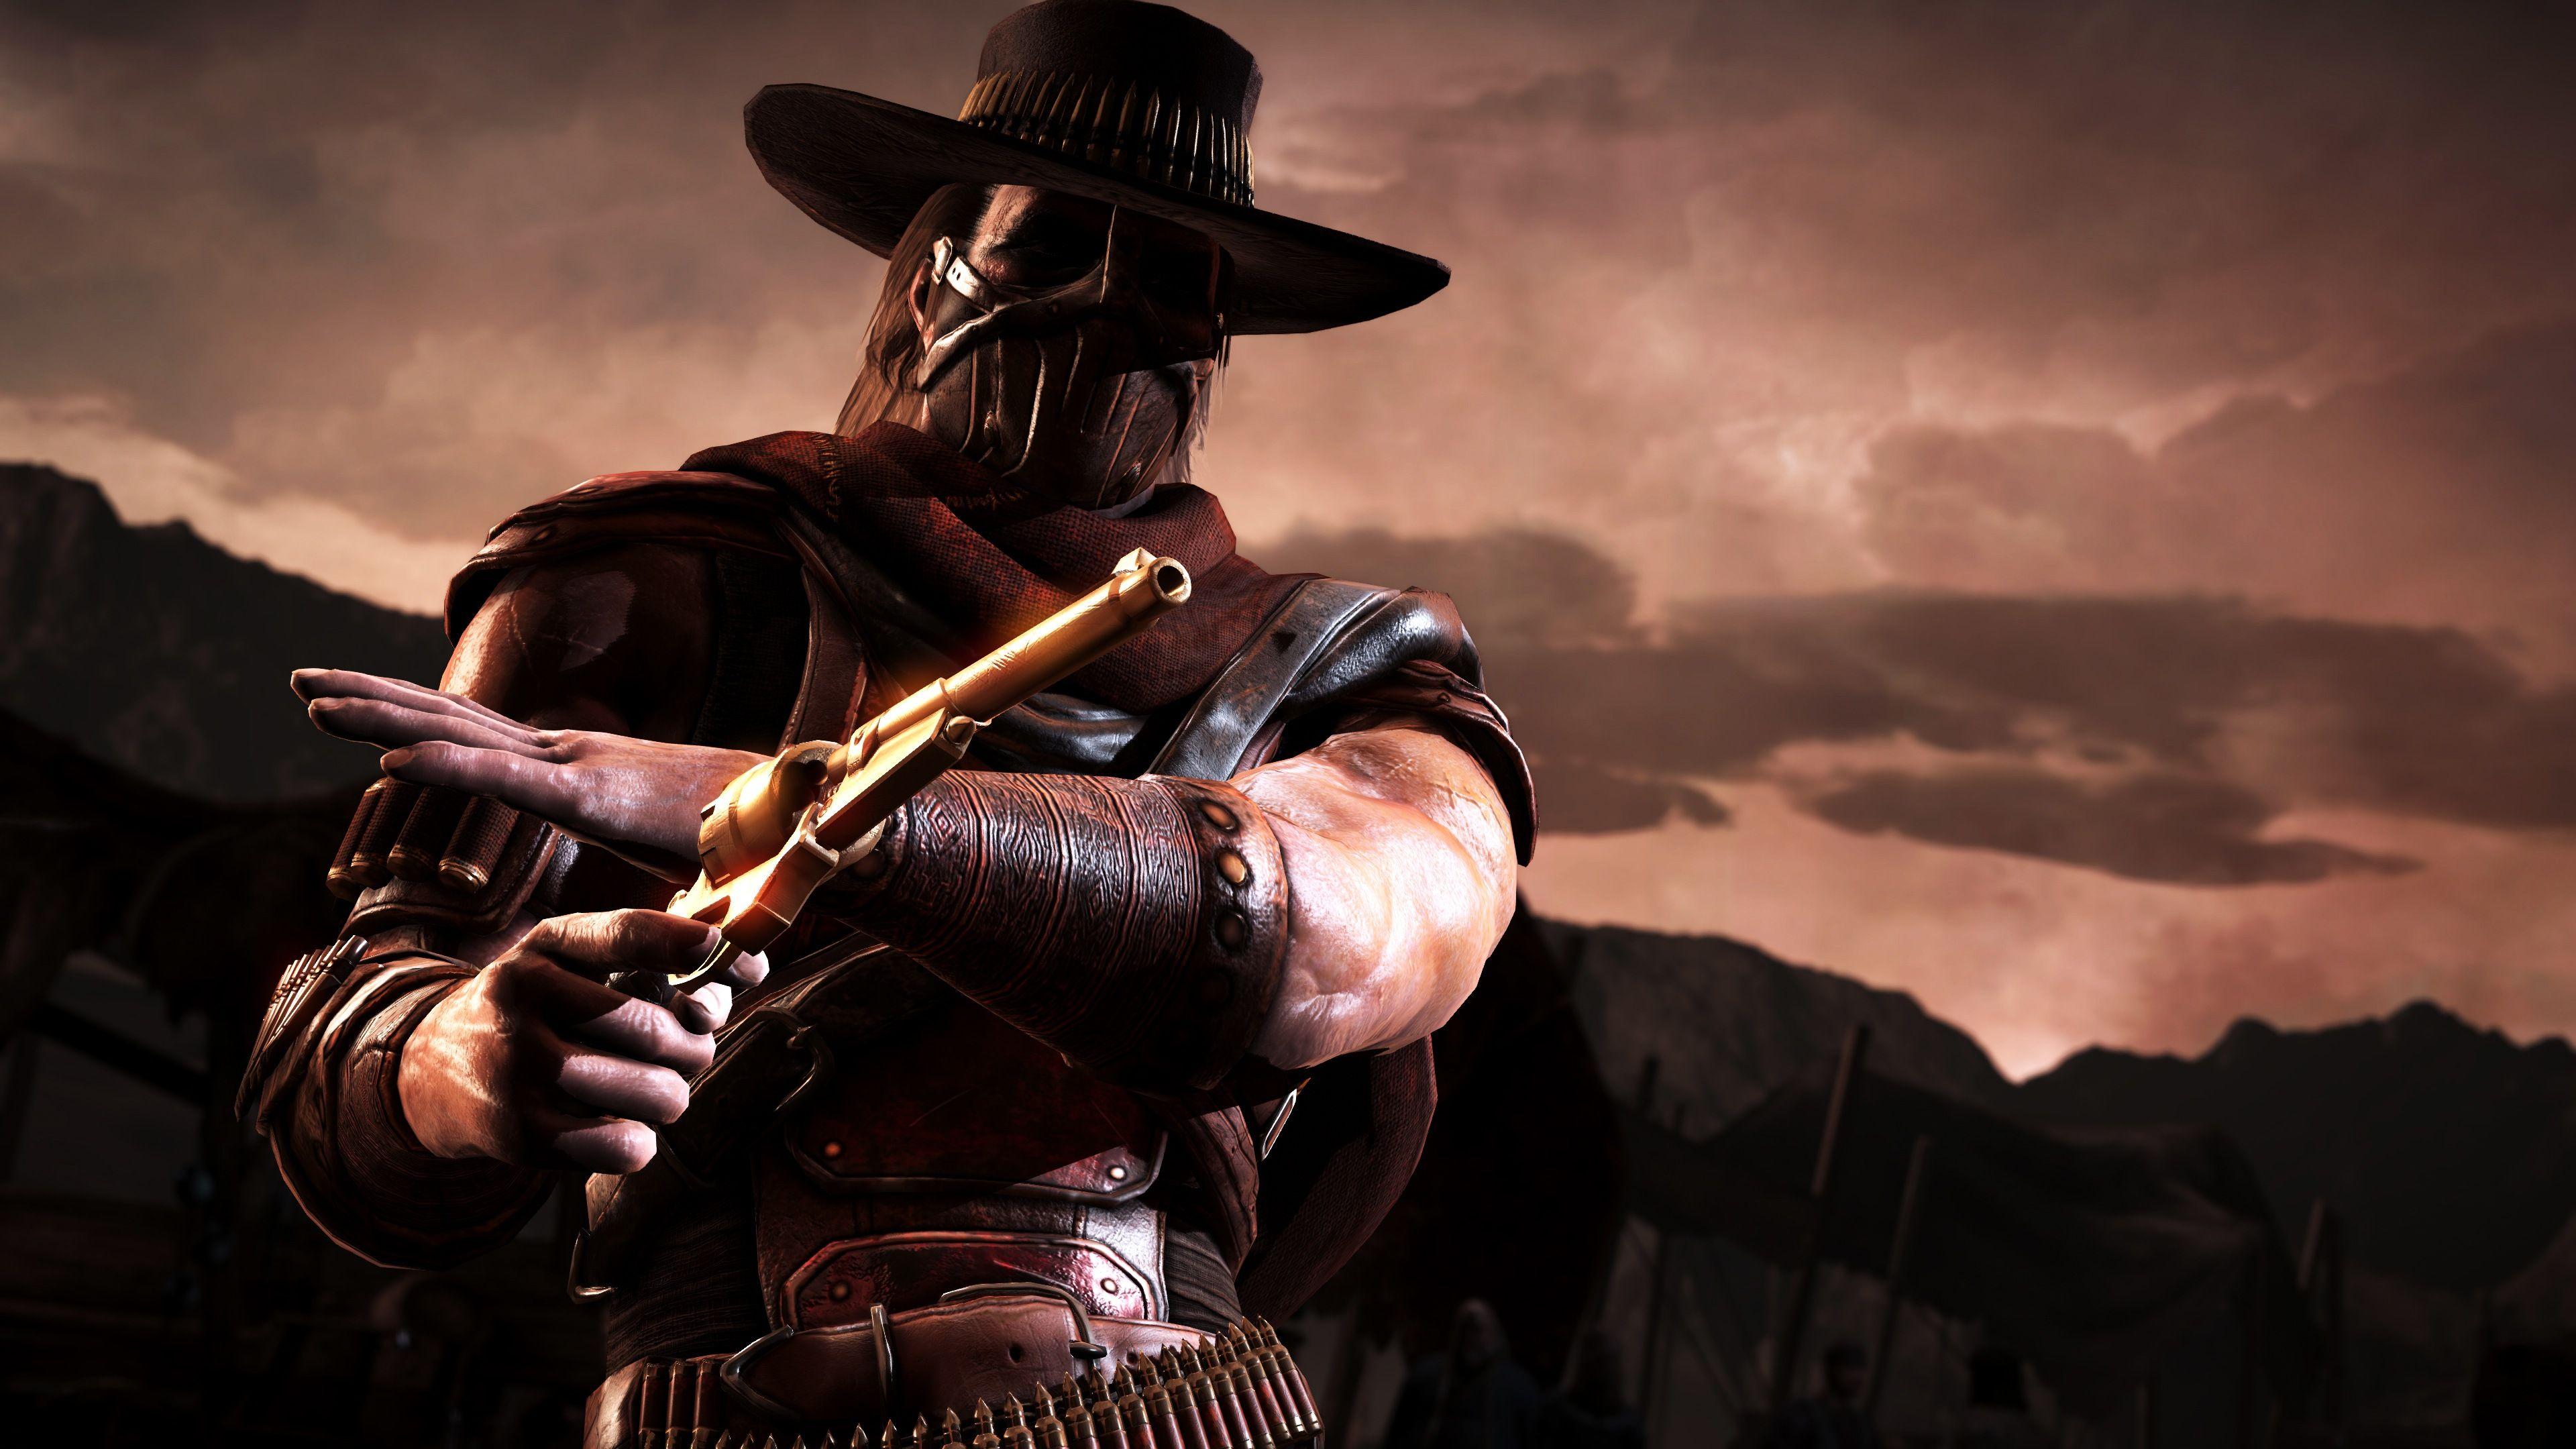 Erron Black Mortal Kombat X Mortal Kombat Scorpion Mortal Kombat